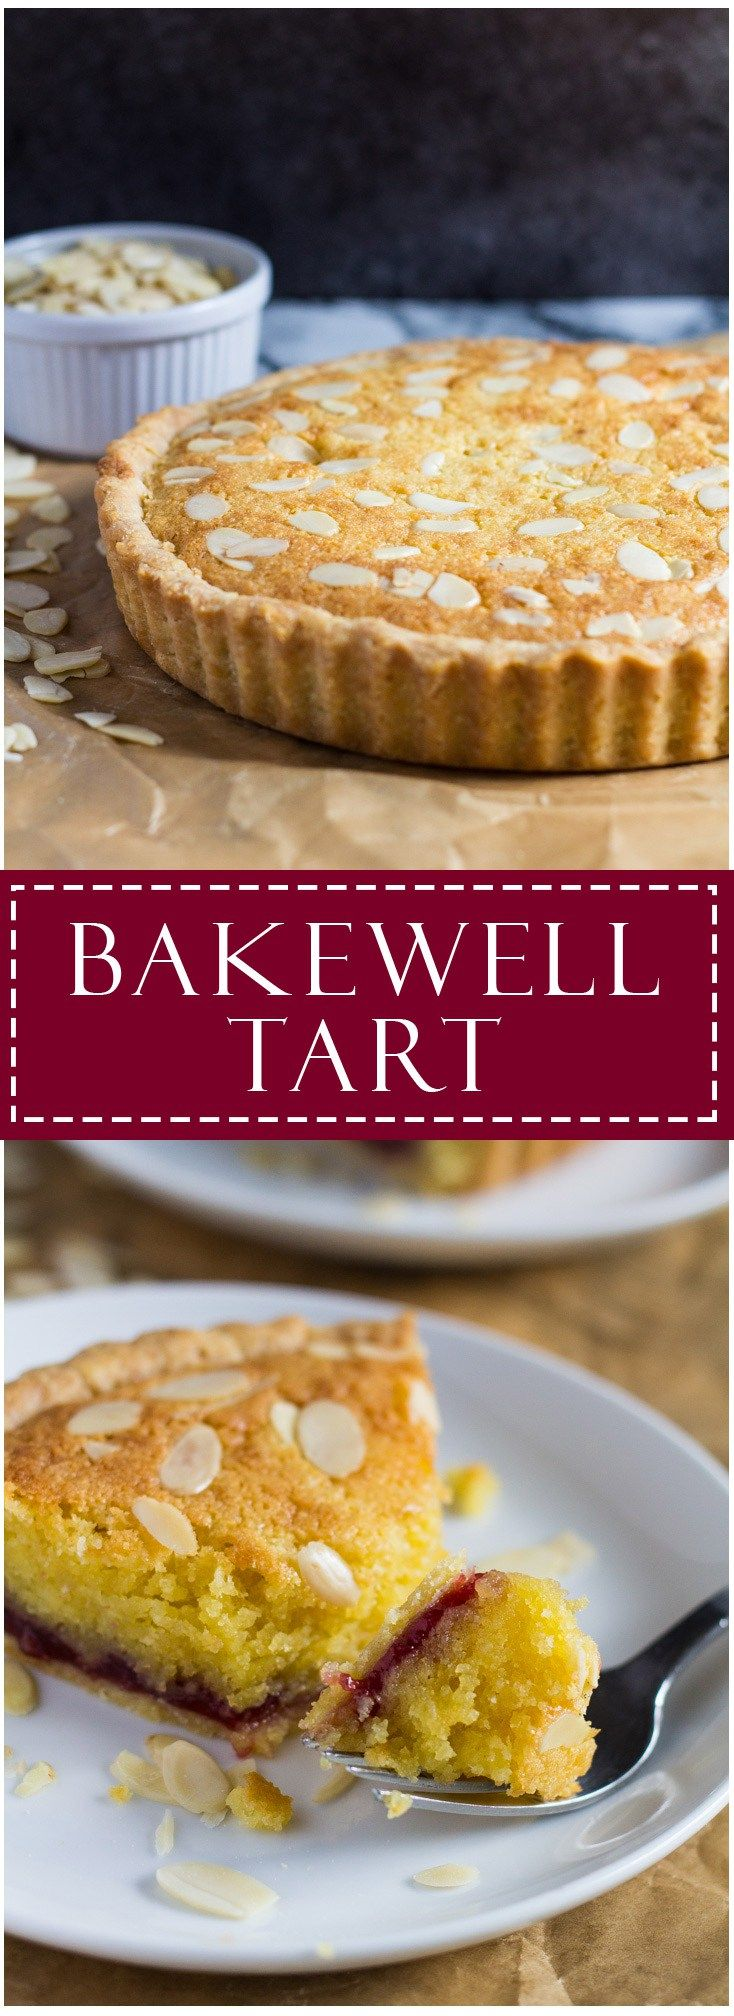 Bakewell Tart | Marsha's Baking Addiction